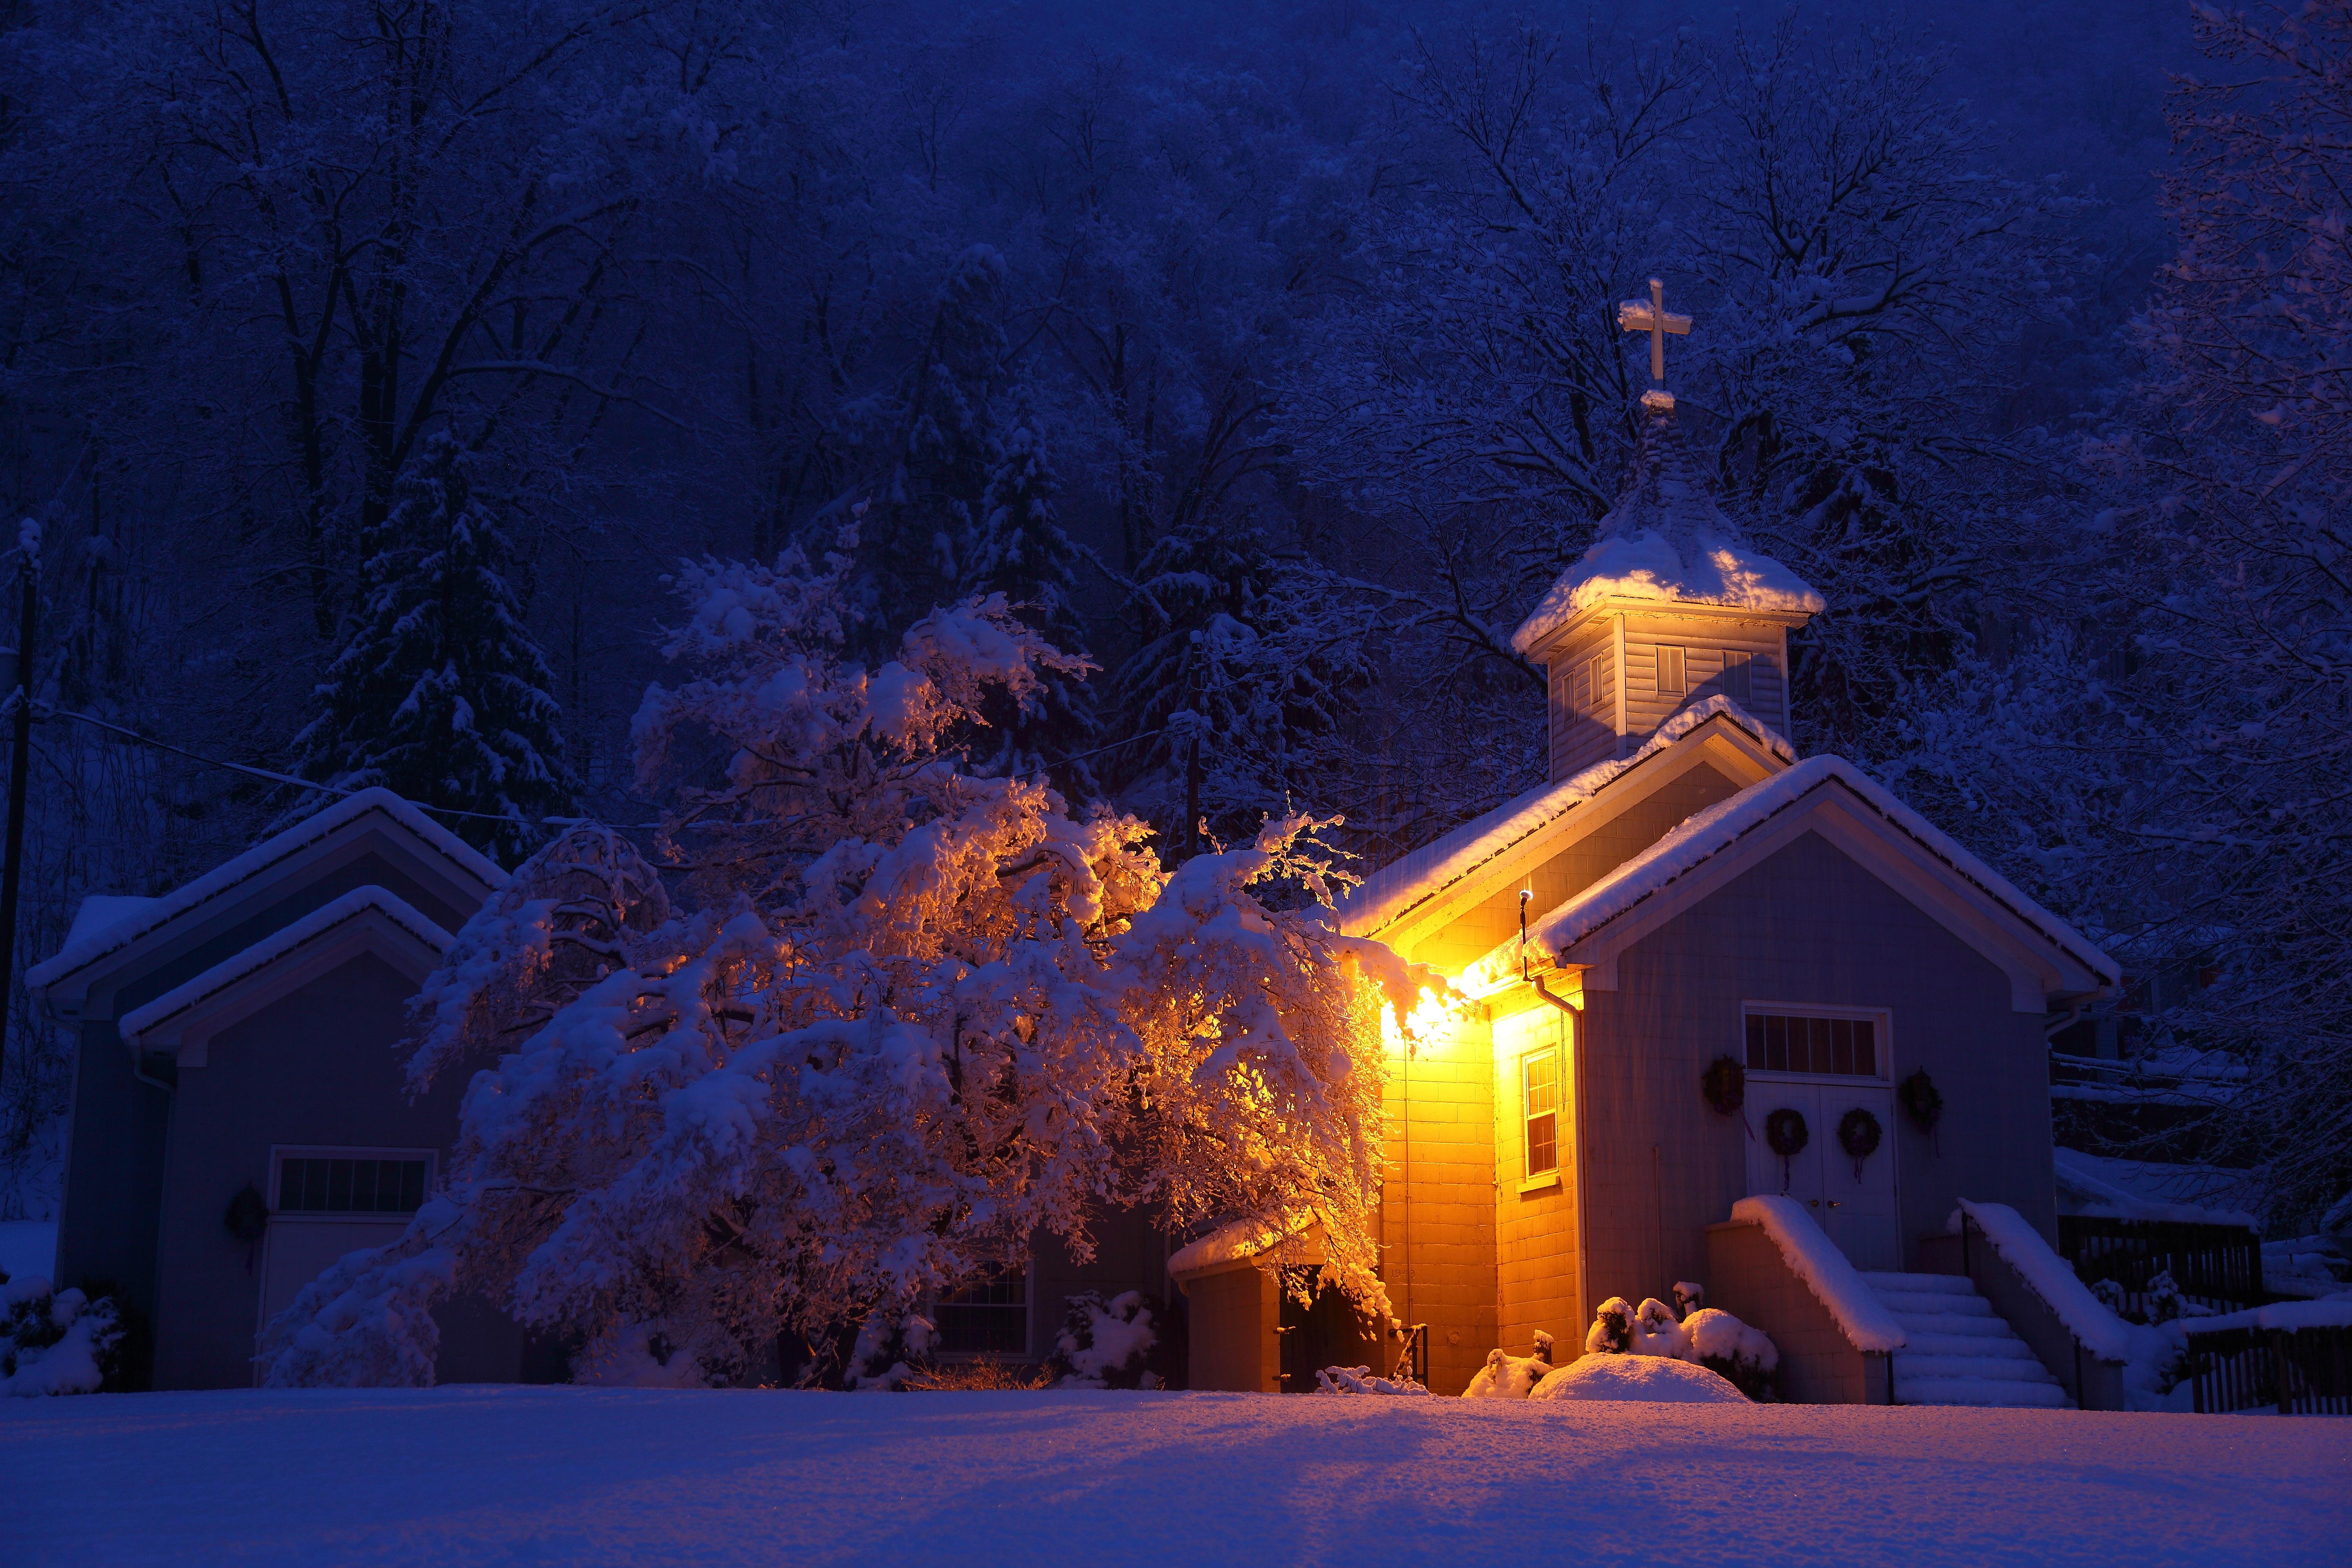 Night snow storm wallpaper